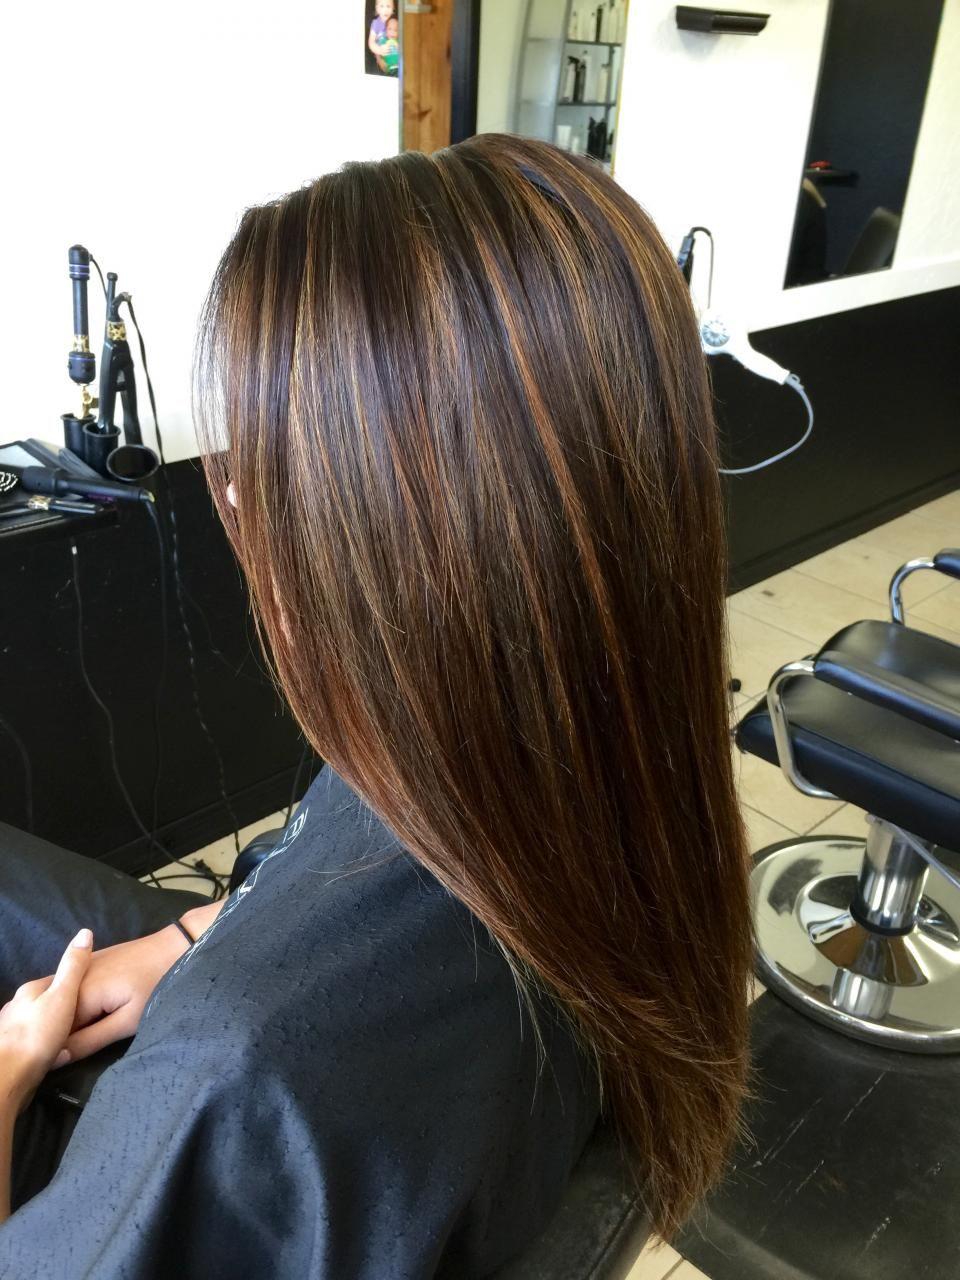 Caramel Highlights Brown Hair And Dark Brown On Pinterest Hair Styles Hair Highlights Caramel Hair